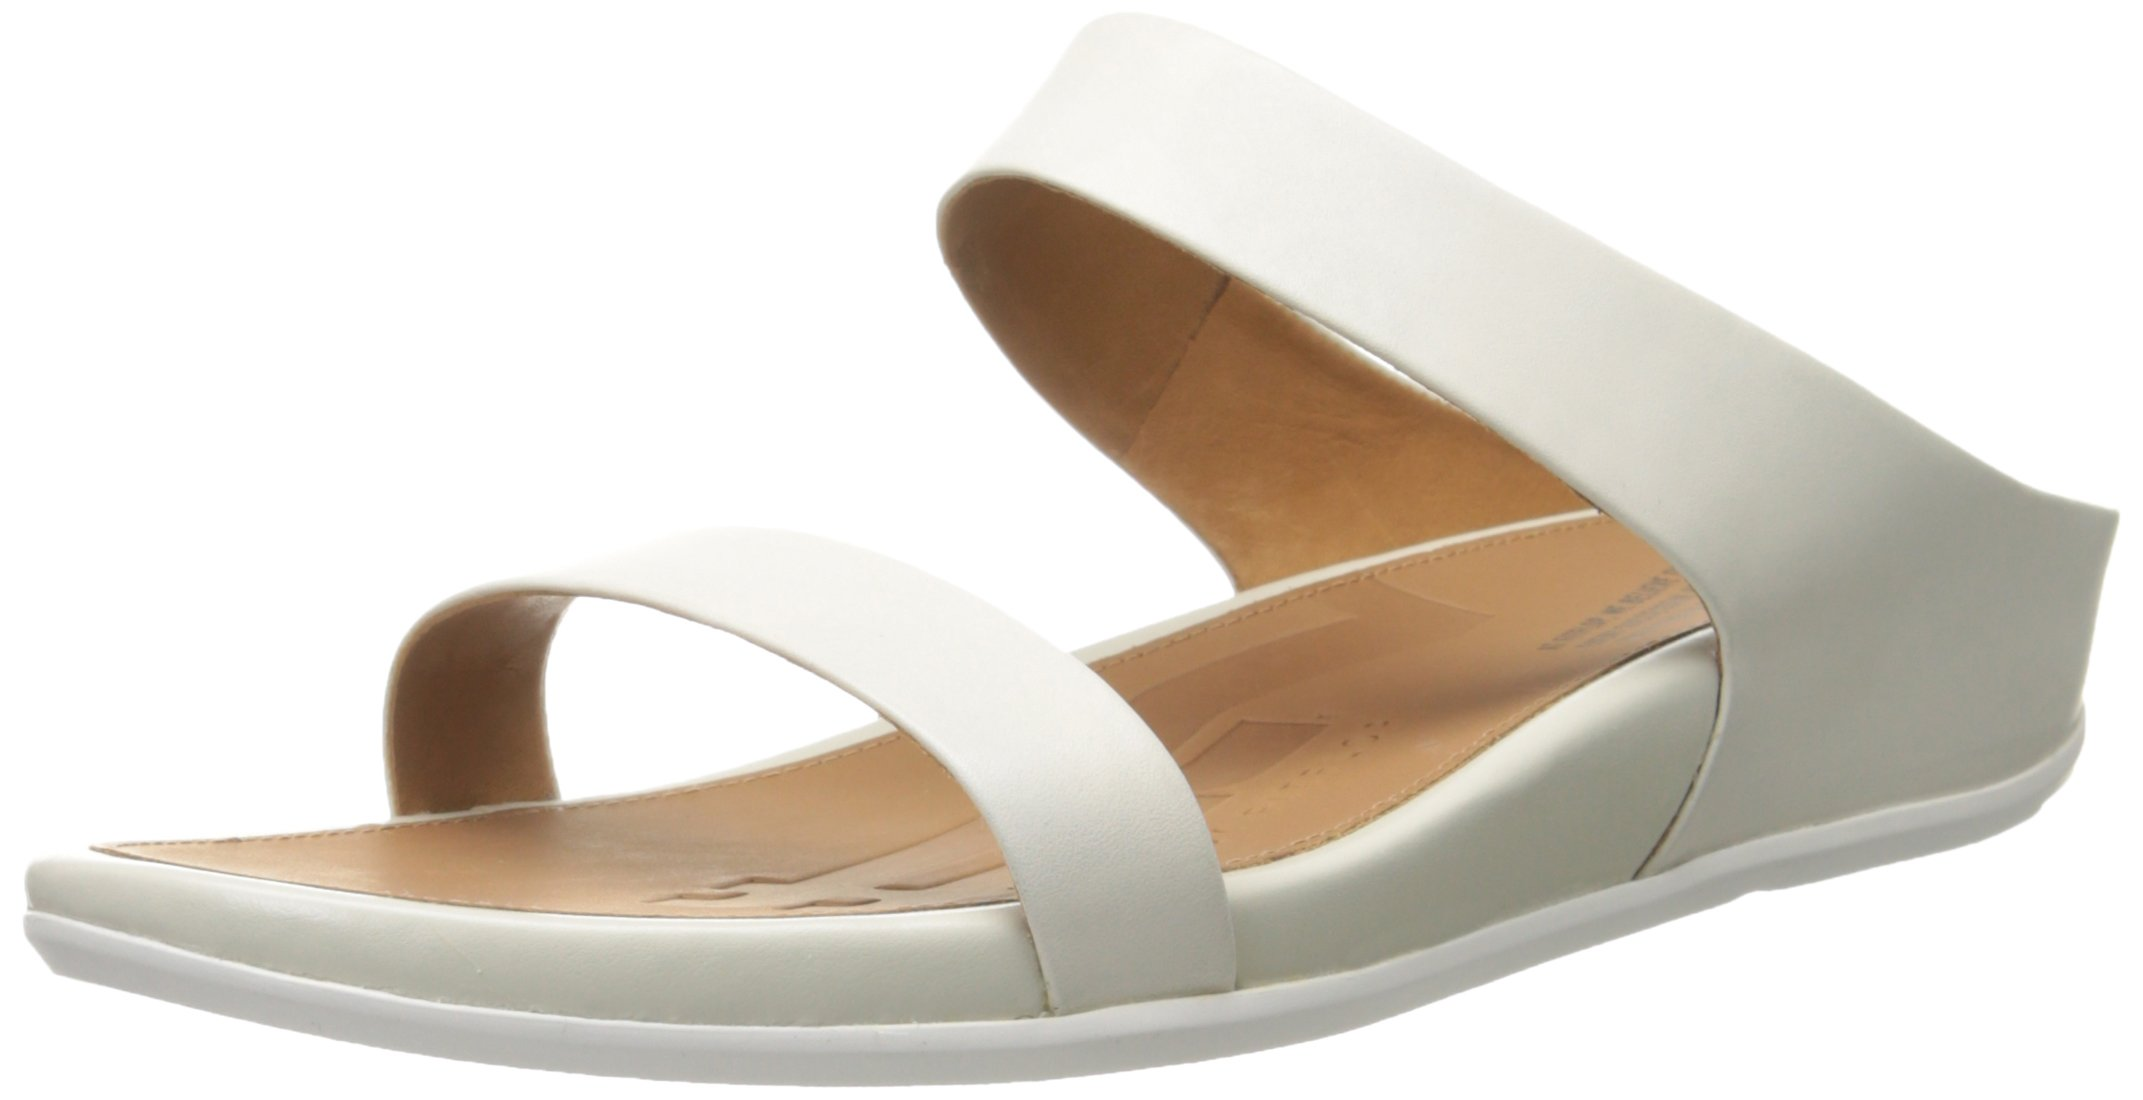 FitFlop Women's Banda Slide Dress Sandal, Urban White, 8 M US